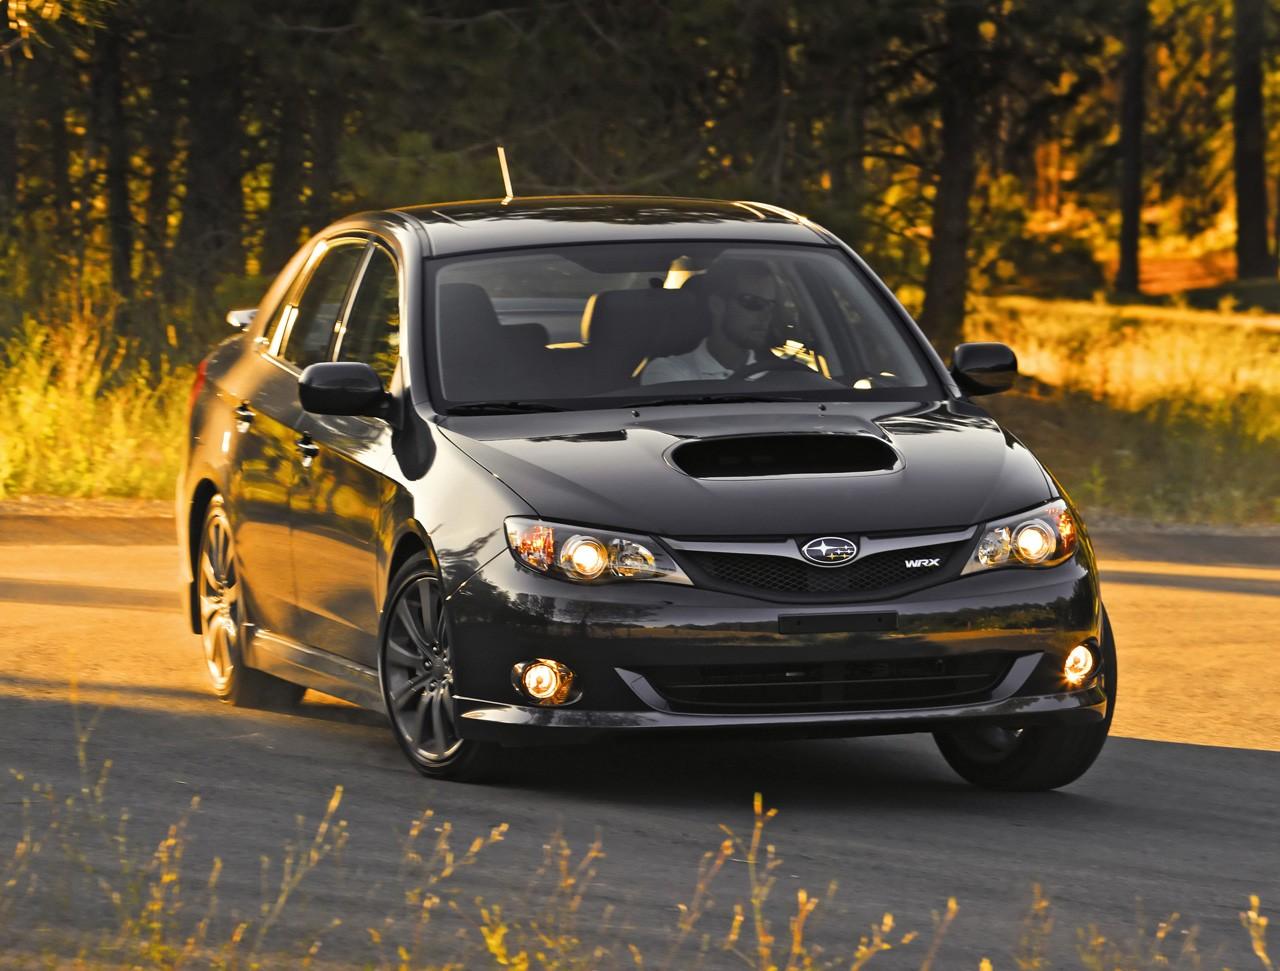 Car Review: 2009 Subaru Impreza WRX265 | Driving